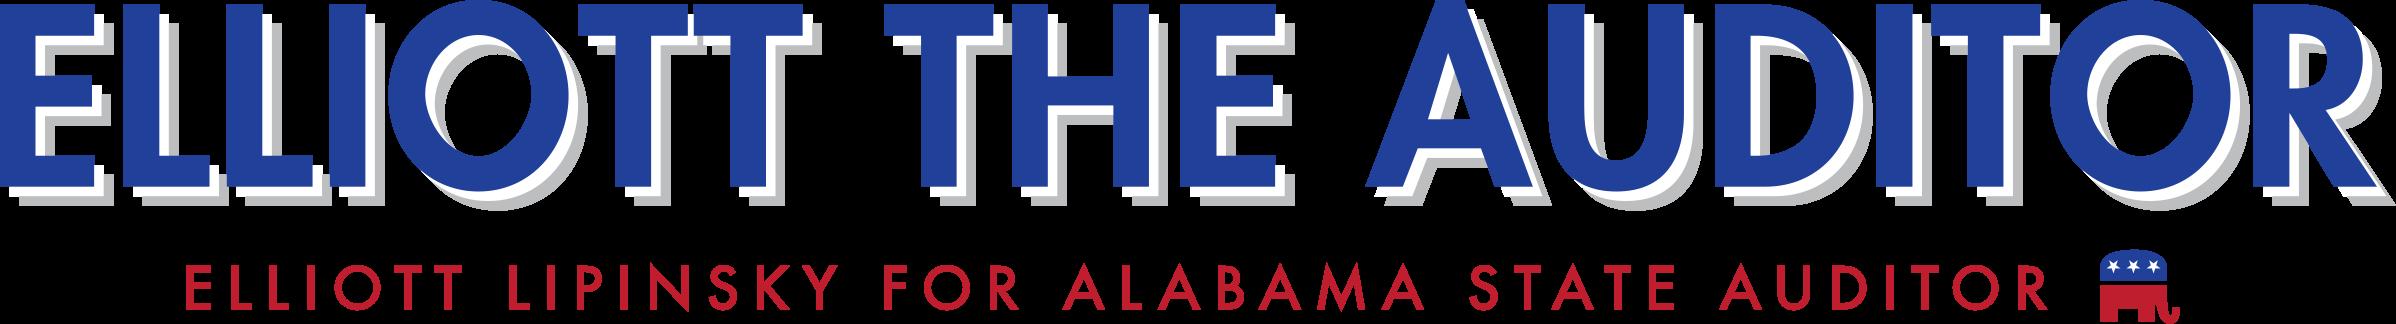 Elect Elliott Lipinsky Alabama State Auditor